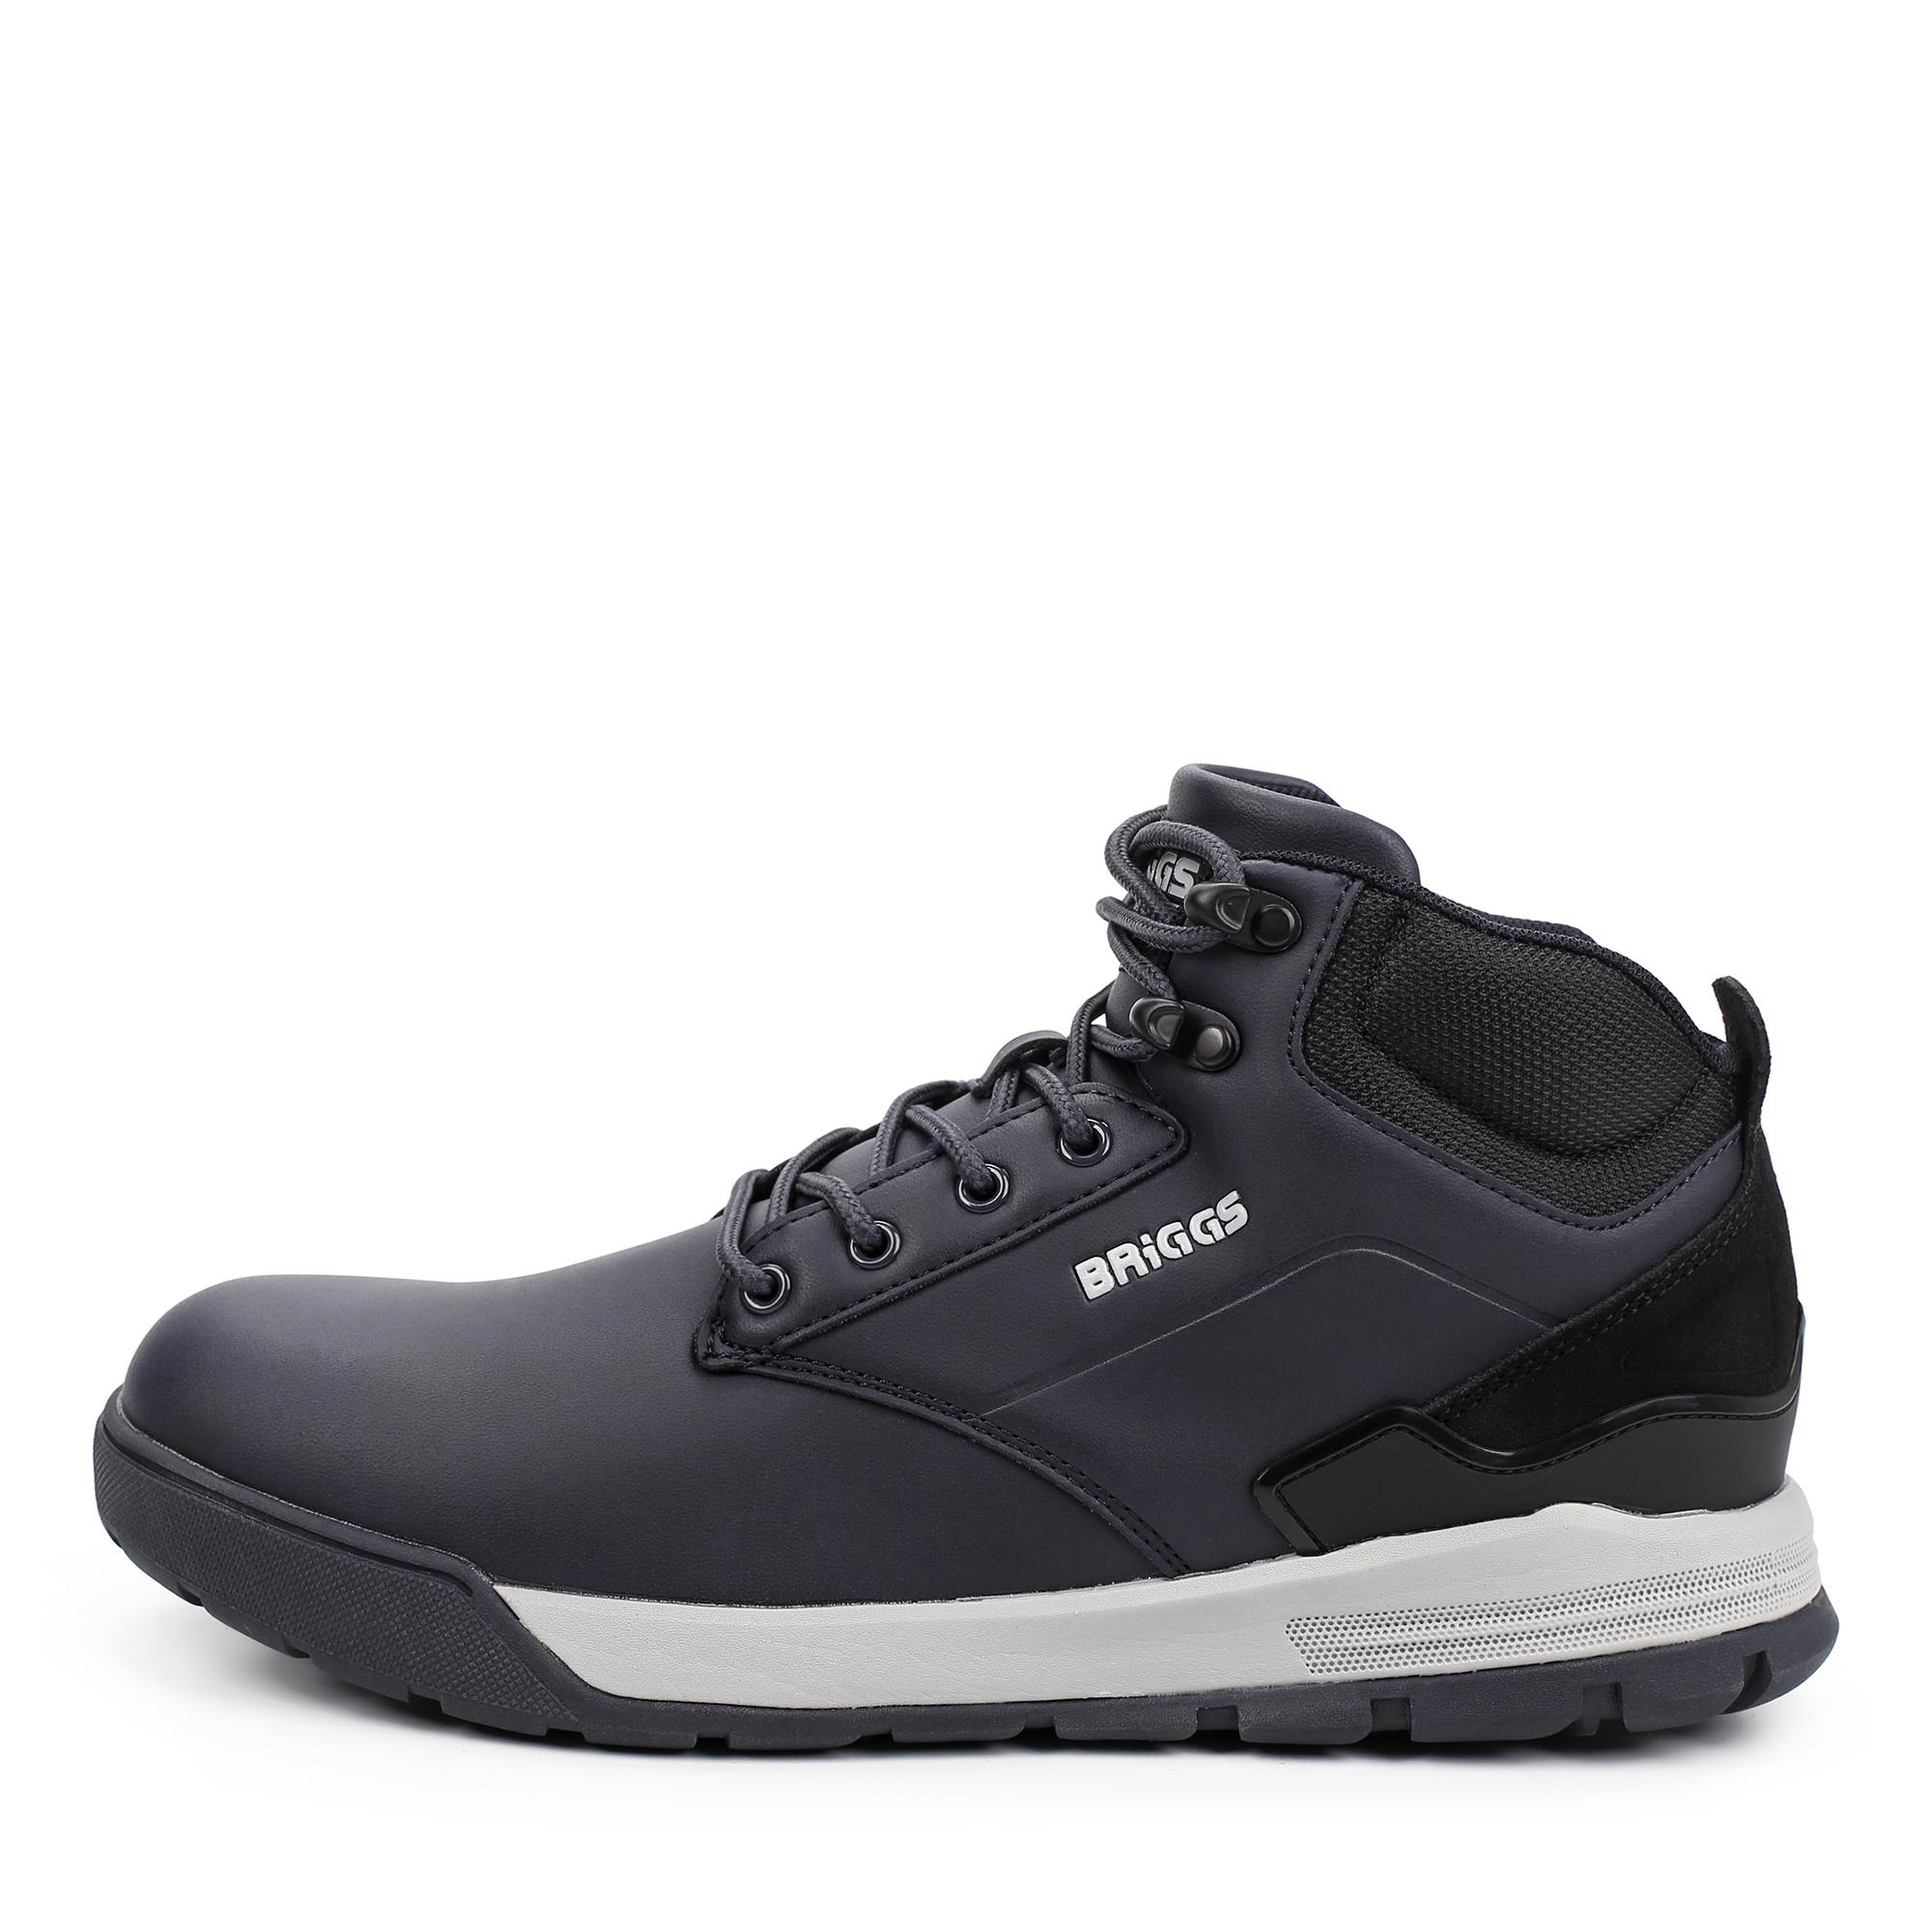 Ботинки BRIGGS 050-033A-2603